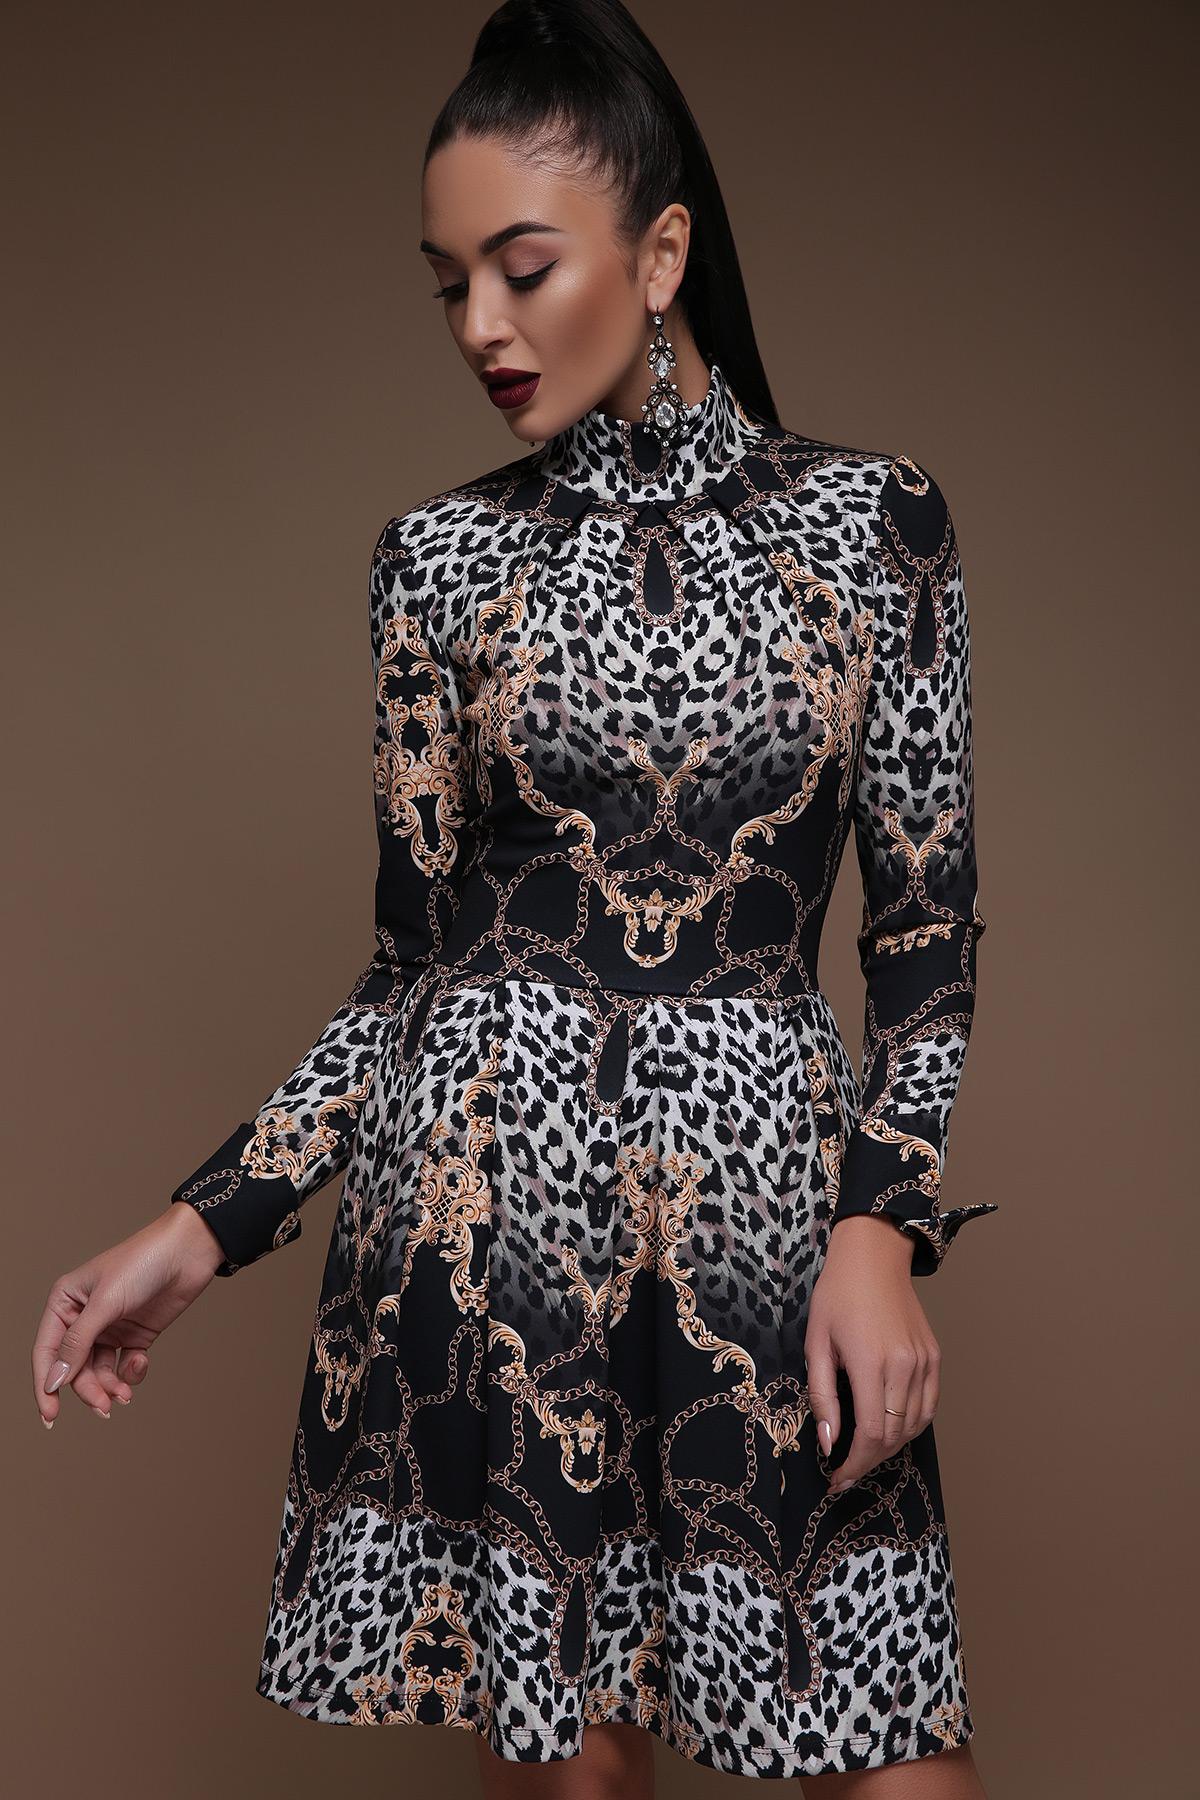 458bf0ea43a леопардовое платье со складками. Леопард-цепи платье Эльнара д р. Цвет